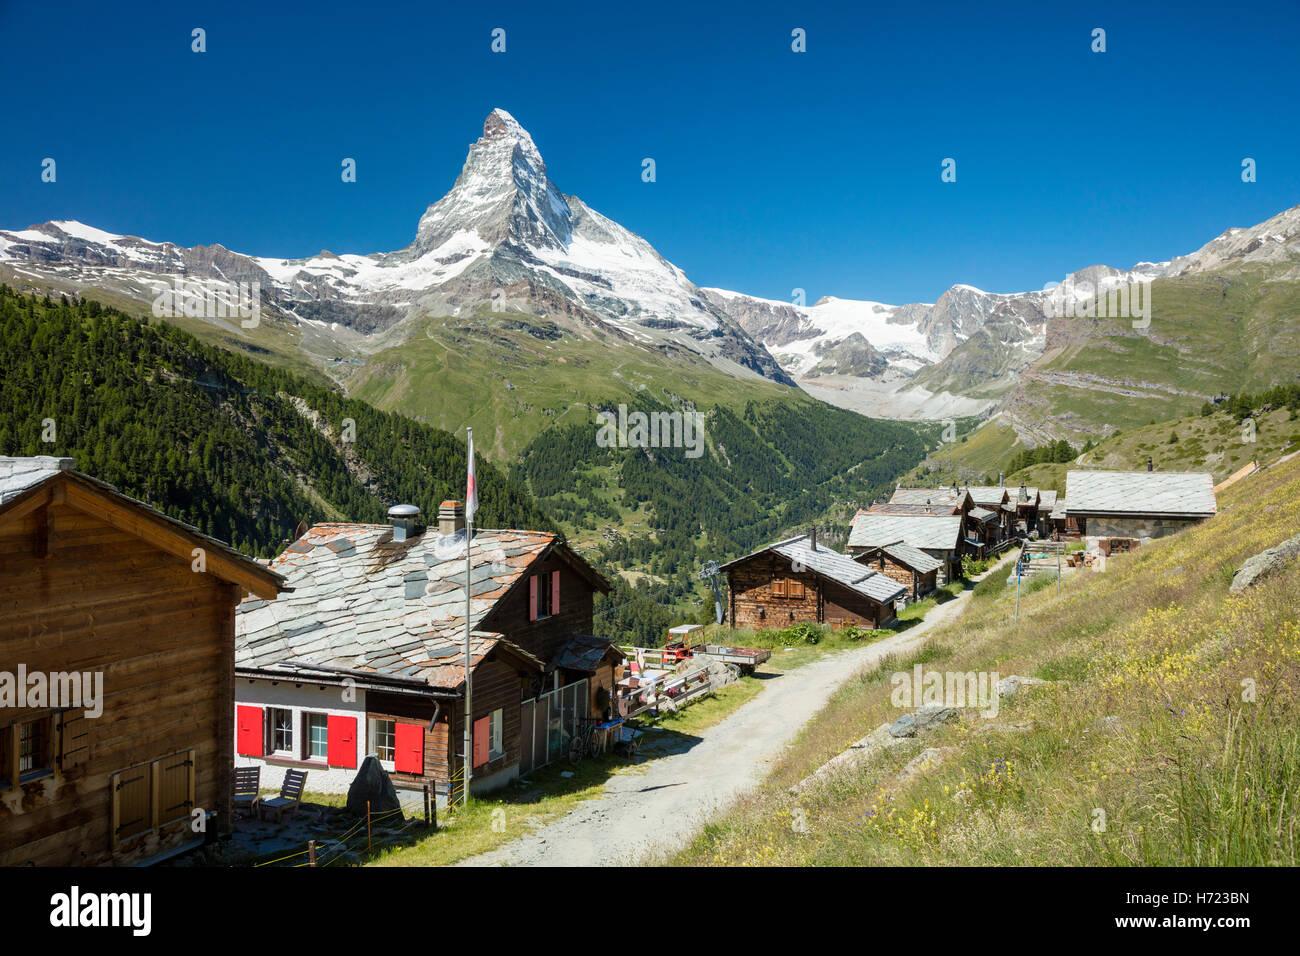 Findeln borgo sotto il Cervino, Zermatt, Pennine, Vallese, Svizzera. Foto Stock